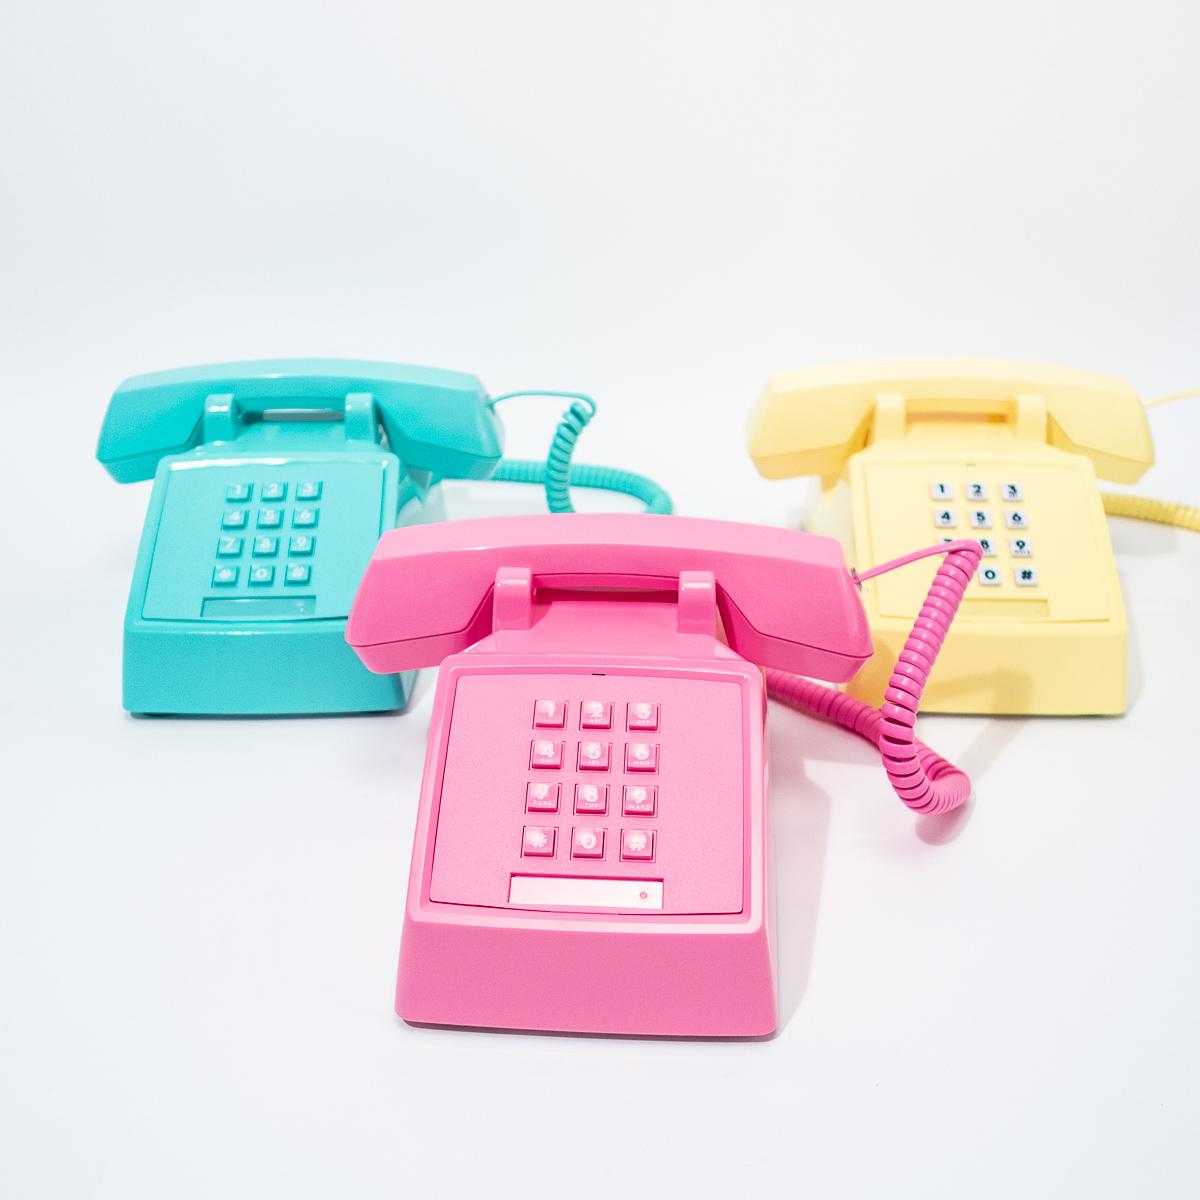 Retro Telefone im 80er Look Pink